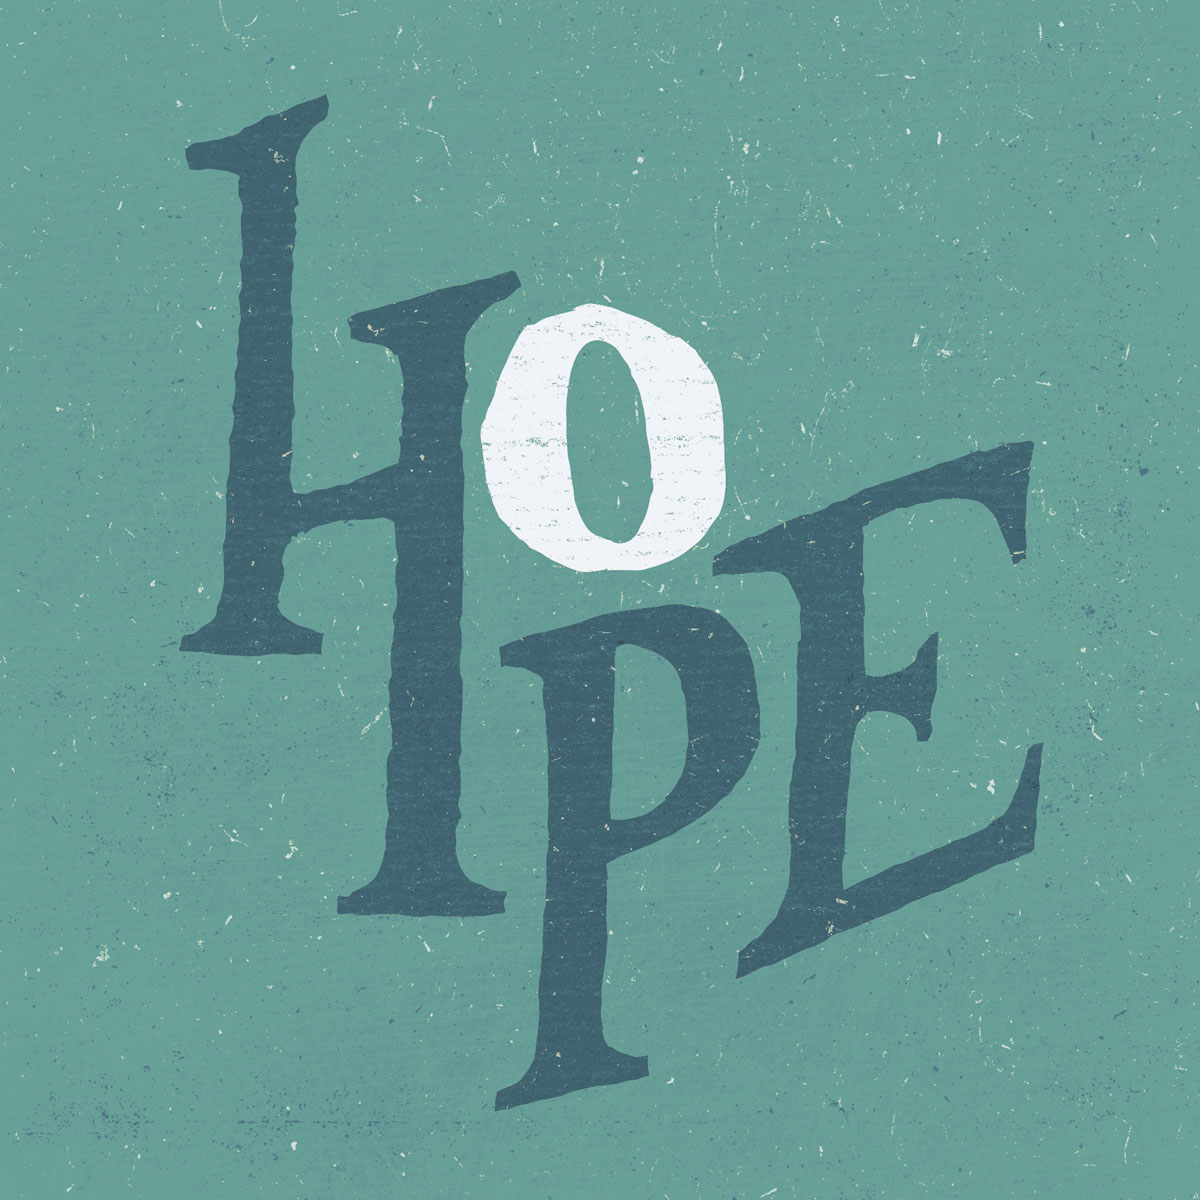 Hope_01.jpg